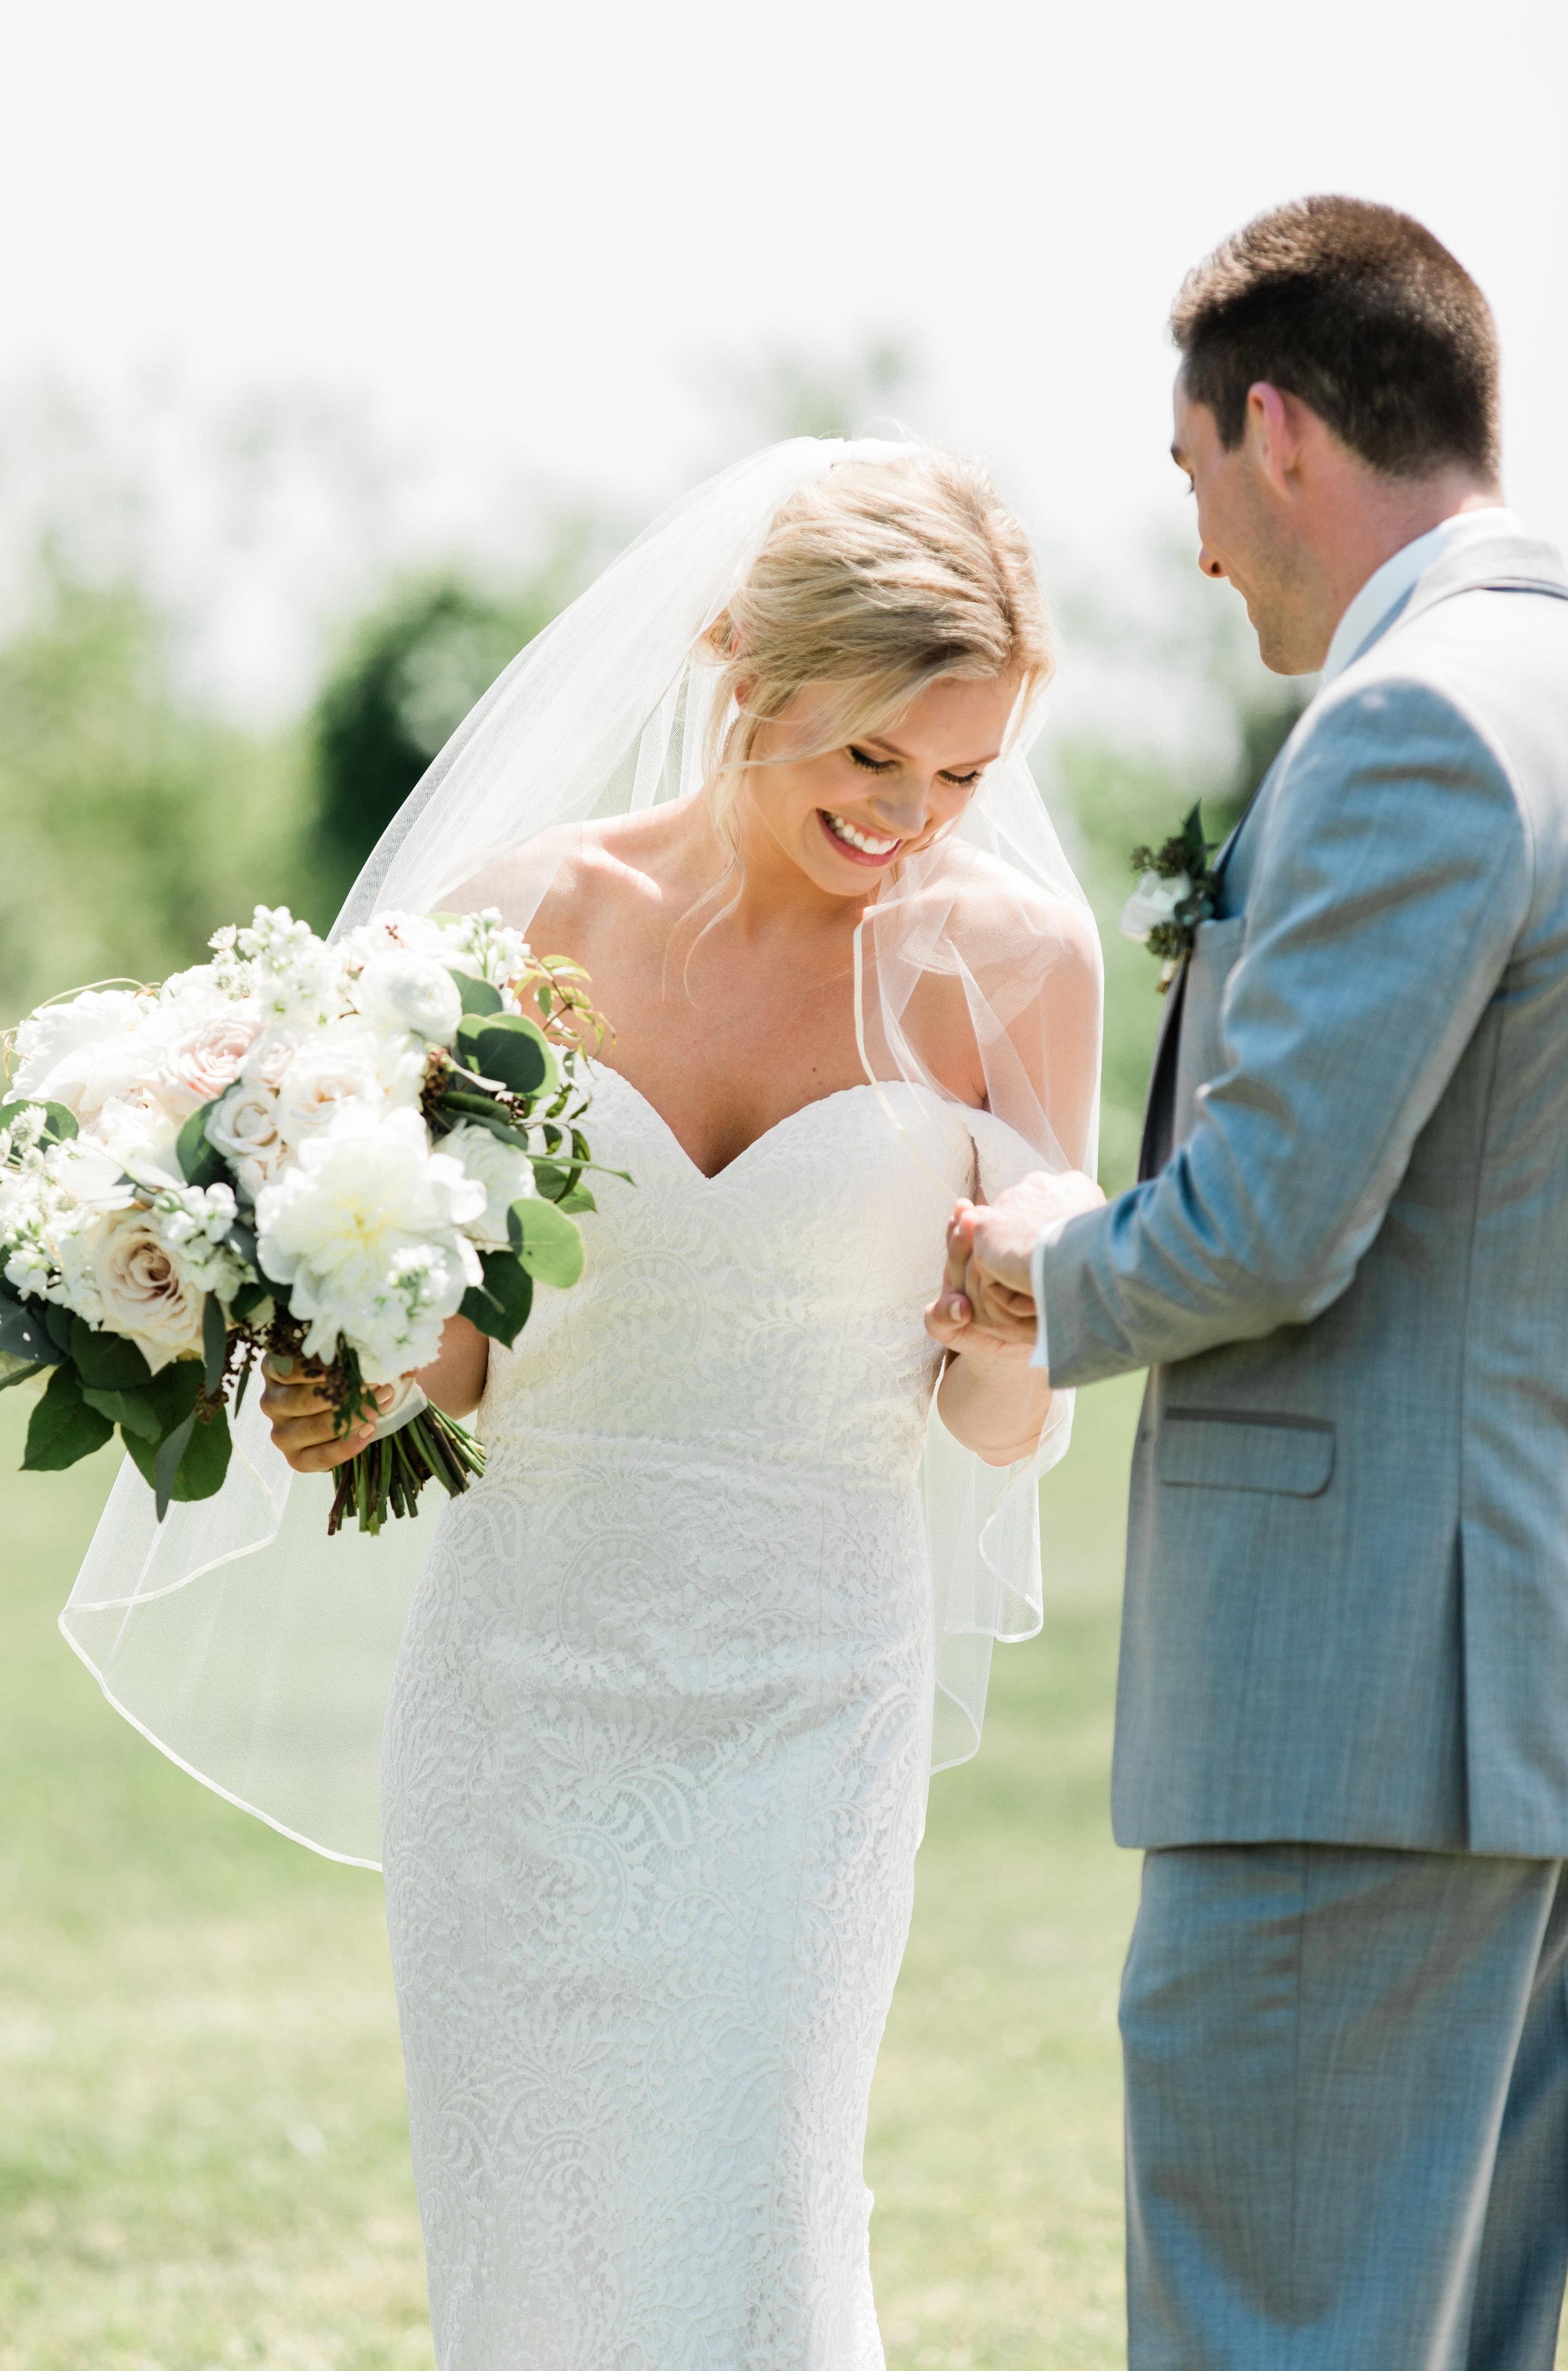 RHODES WEDDING - MARISSA CRIBBS PHOTOGRAPHY-163.jpg